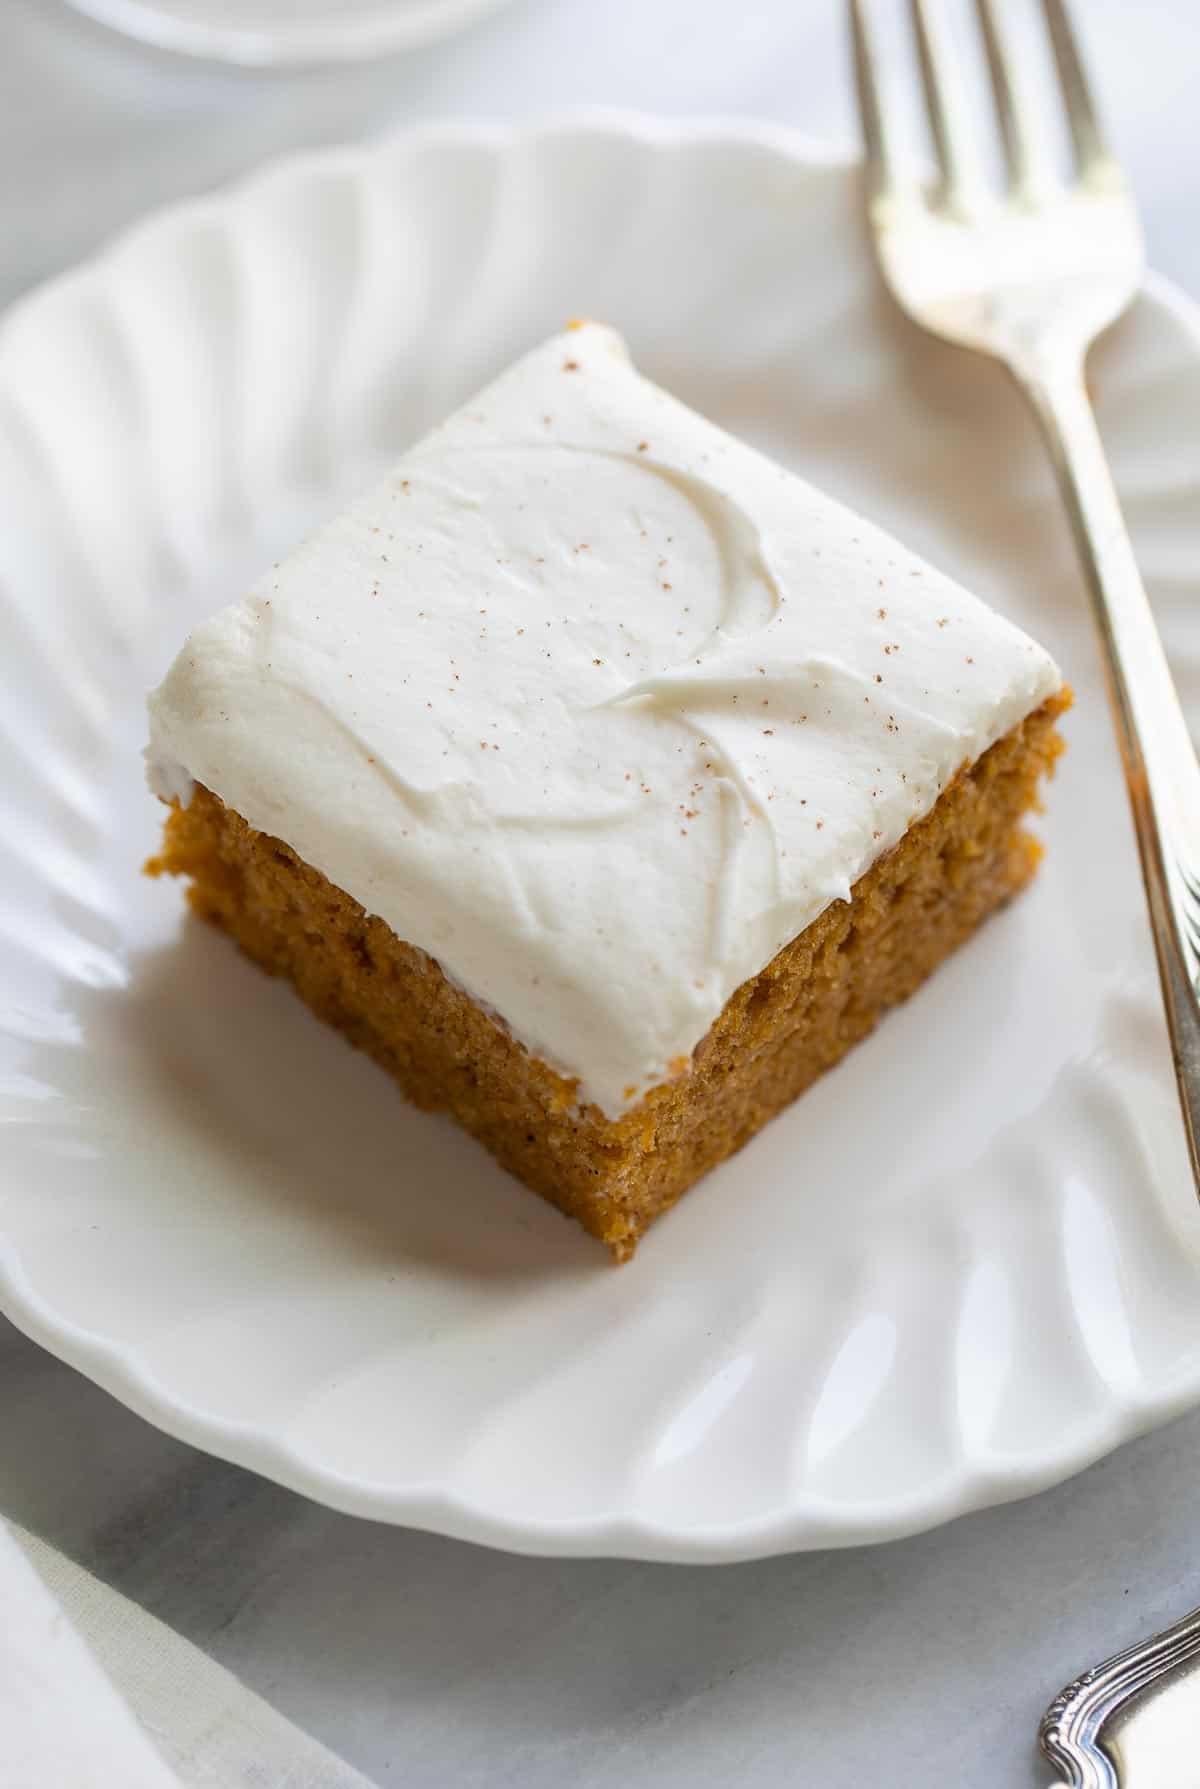 gluten free pumpkin bar on white plate with fork